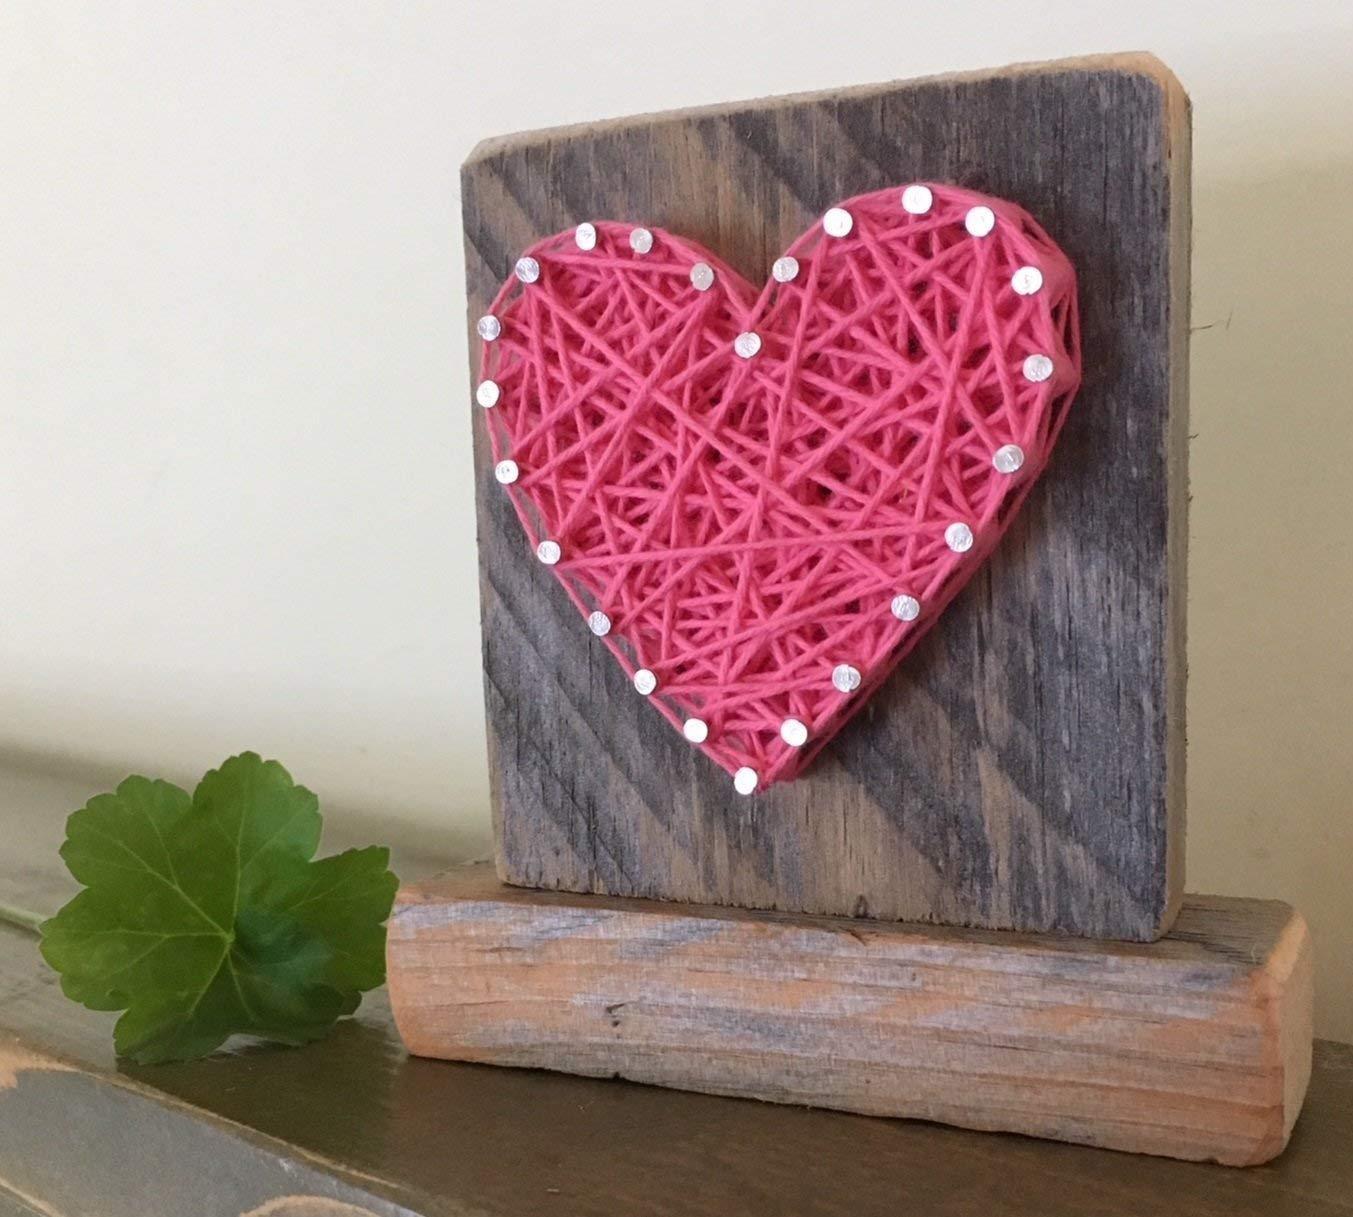 Amazon.com: Sweet & small freestanding wooden pink string art heart ...